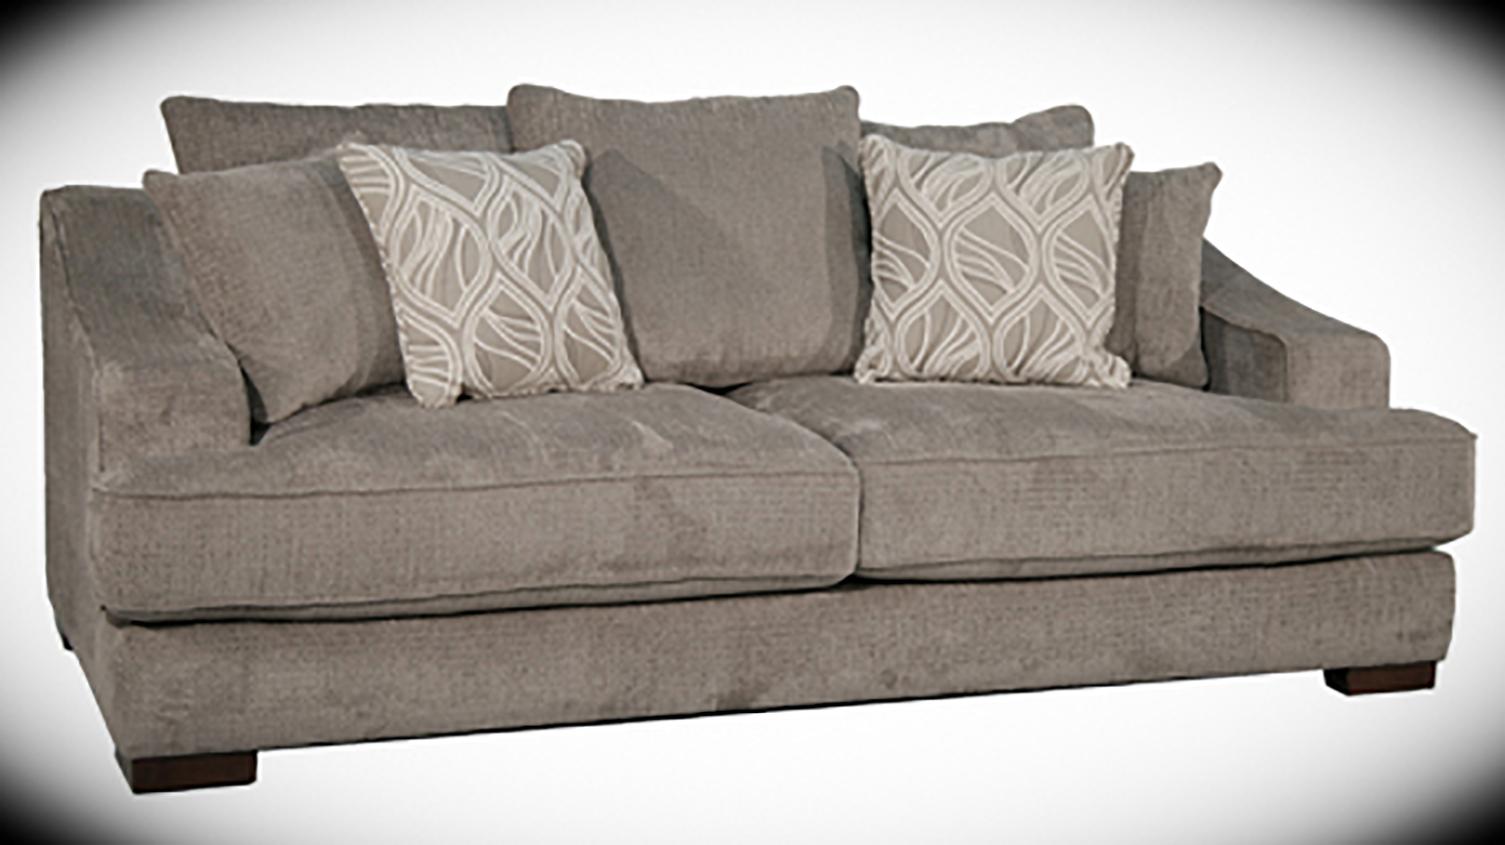 Overstuffed Sofa Sofas Magnificent Overstuffed Chairs Deep